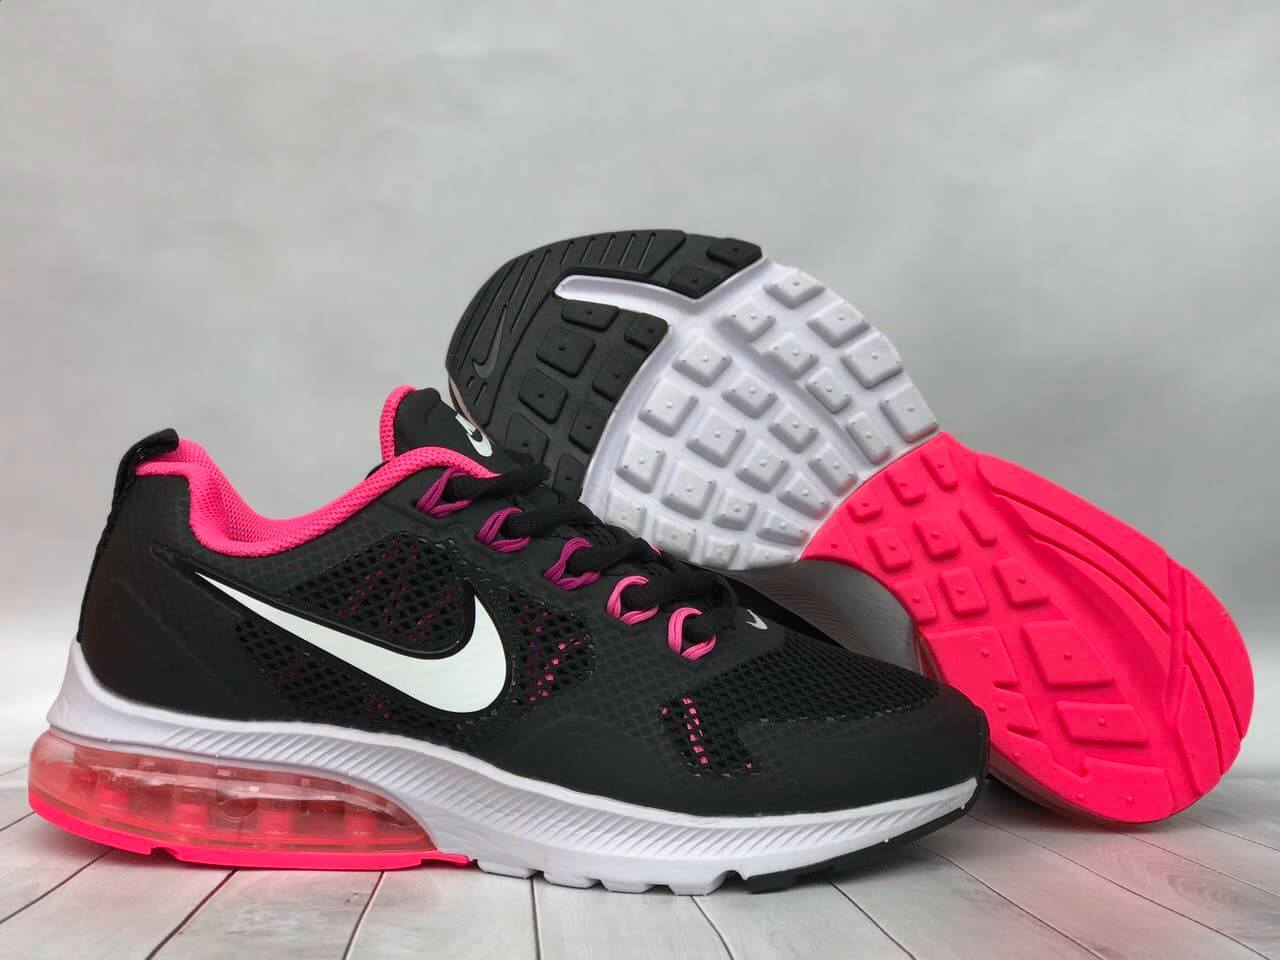 Nike Airmax 2020 - Restock